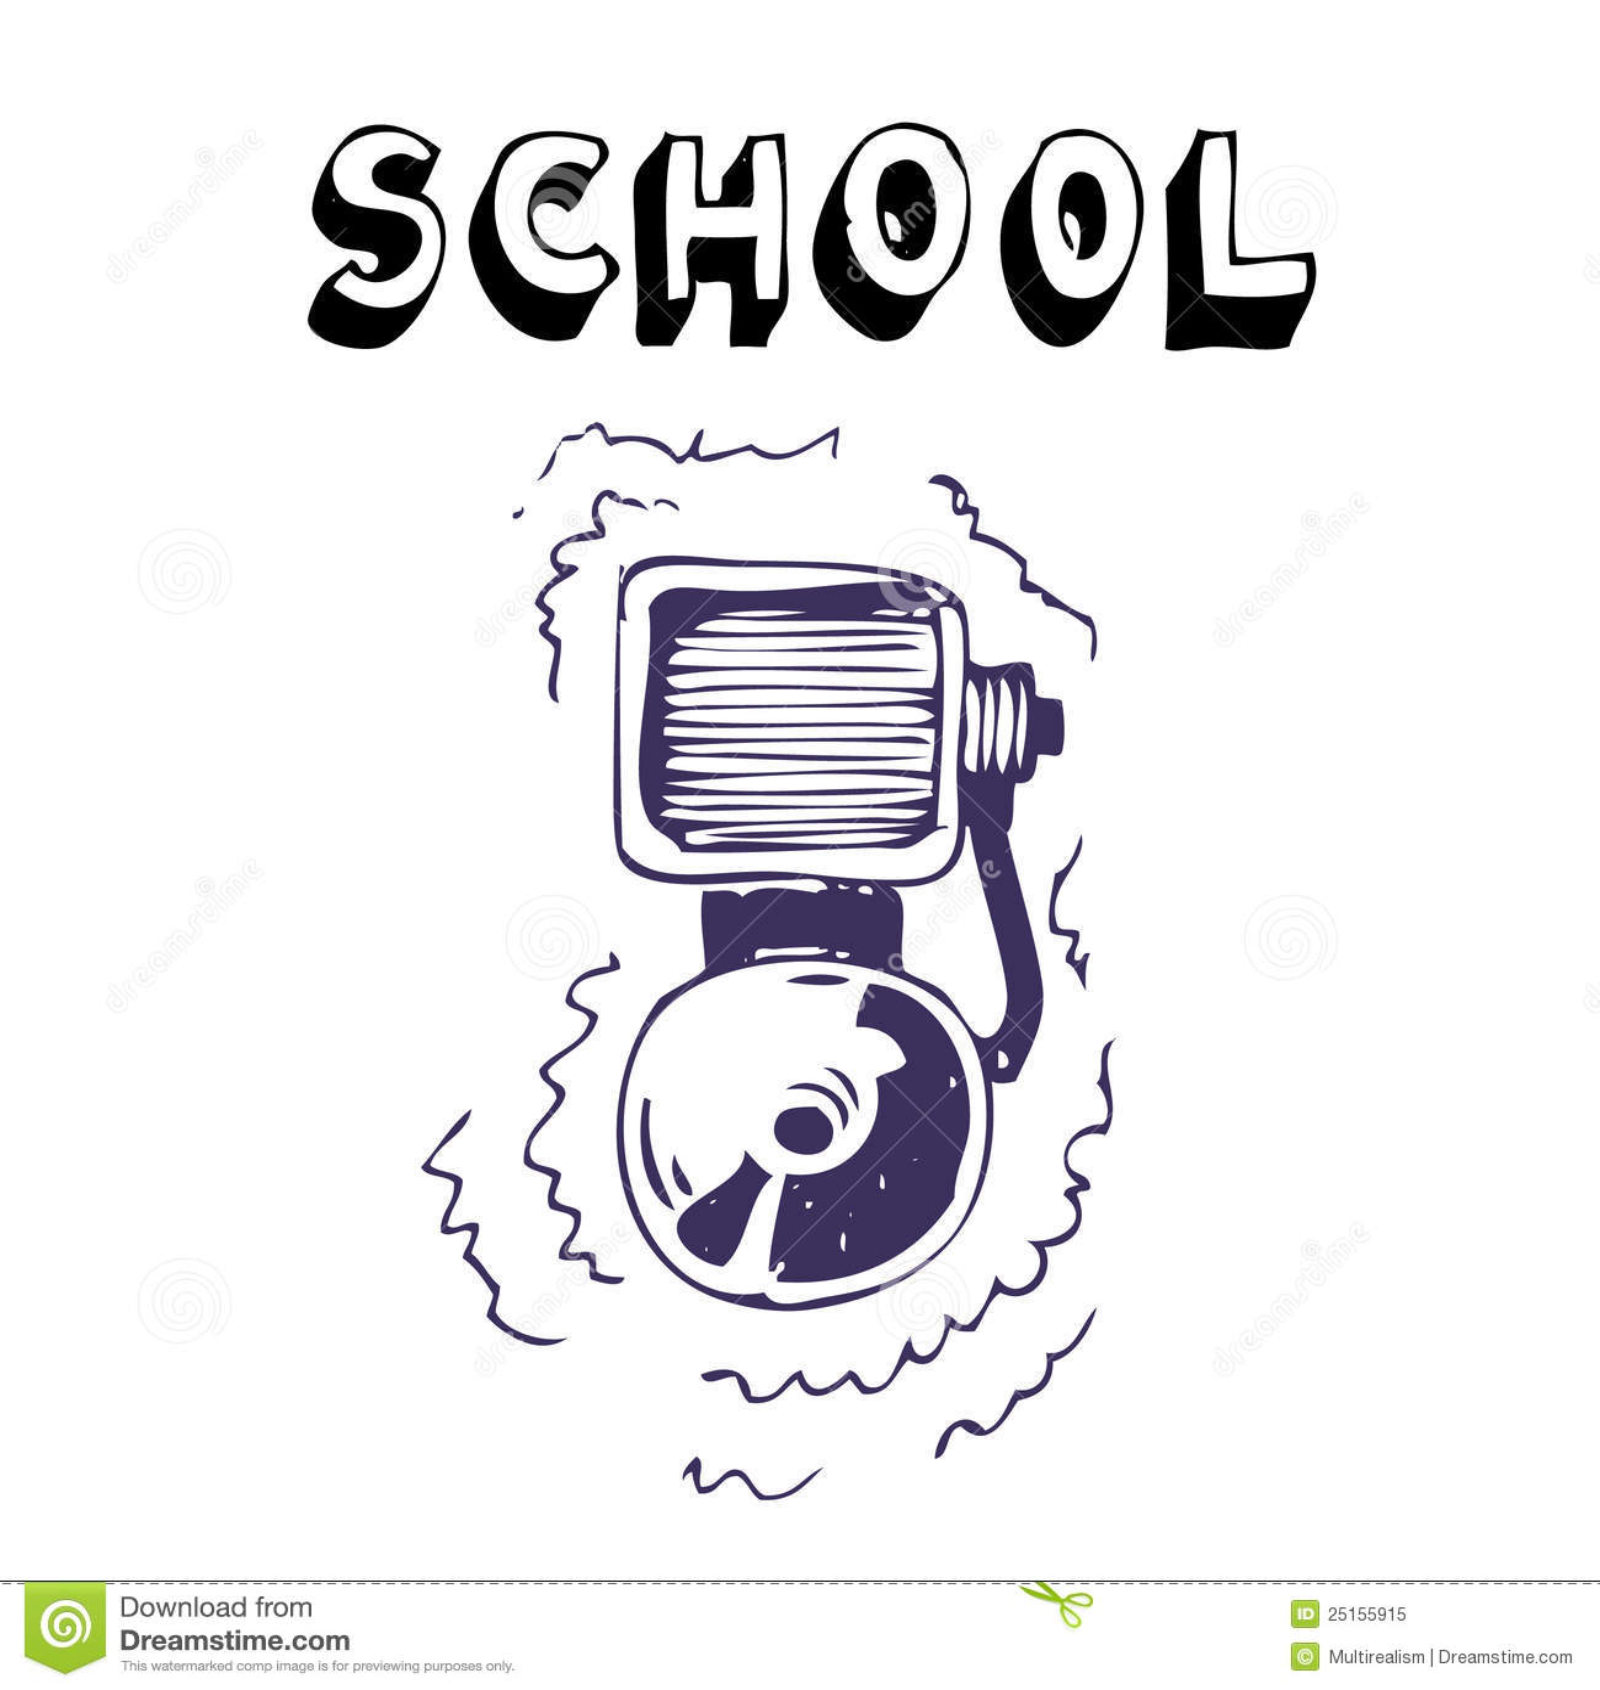 Business plan on a creative international school